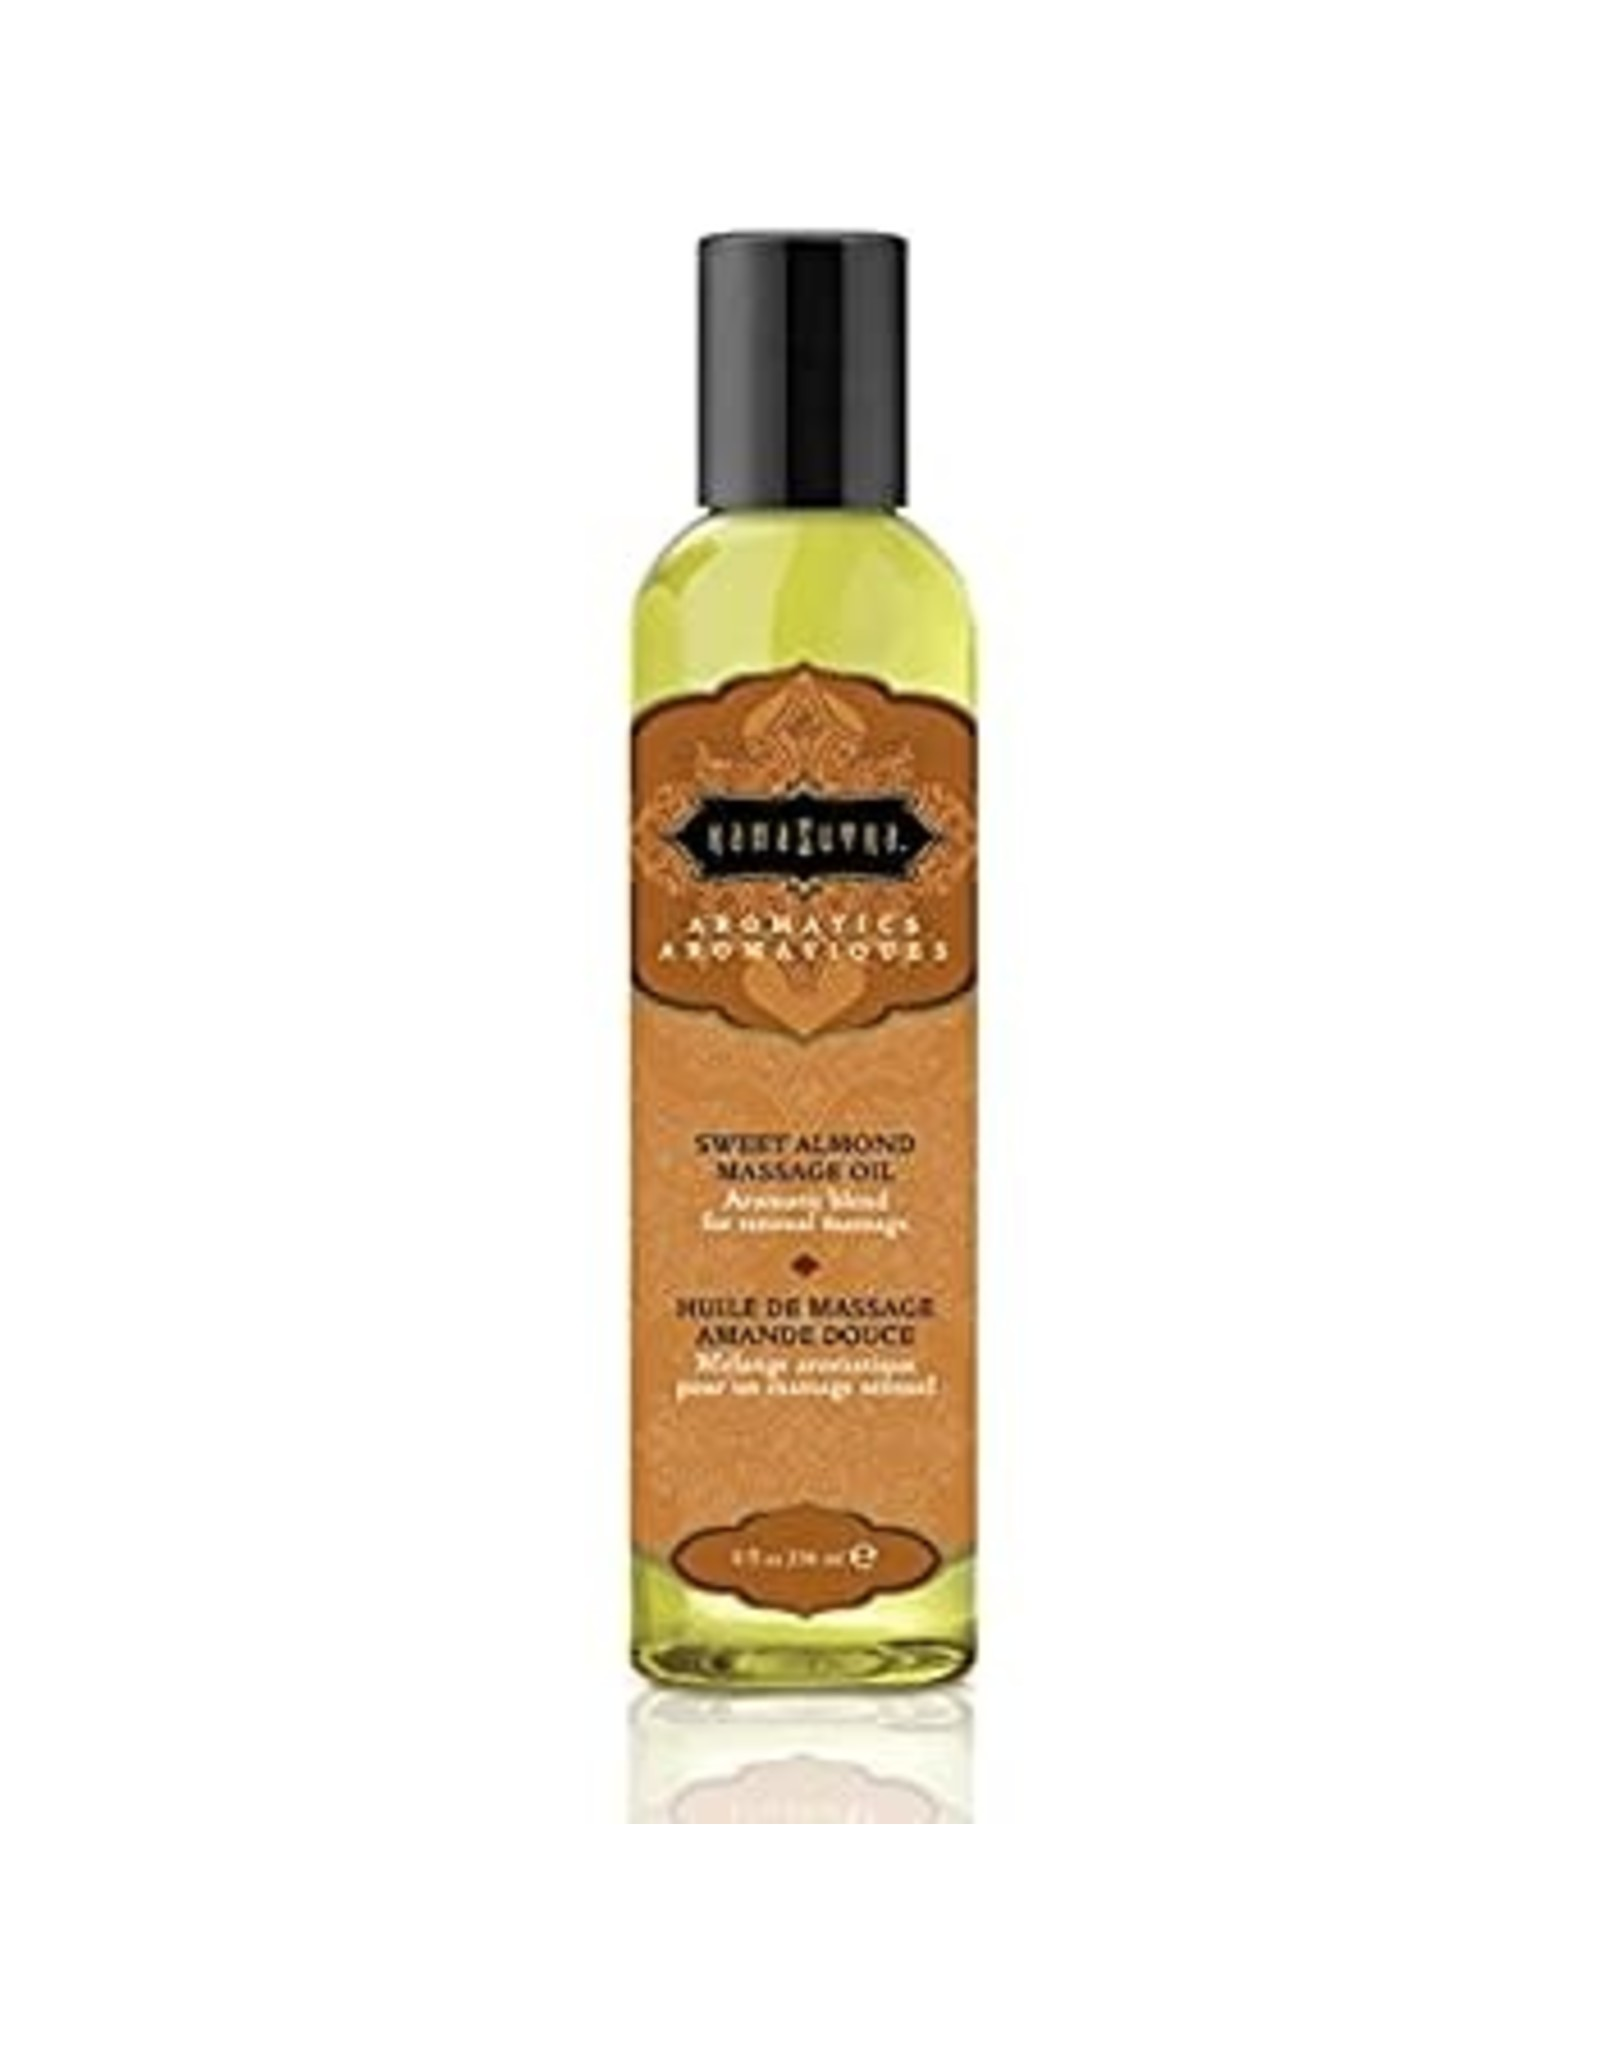 Kama Sutra Kama Sutra Sweet Almond Massage Oil 739122000215